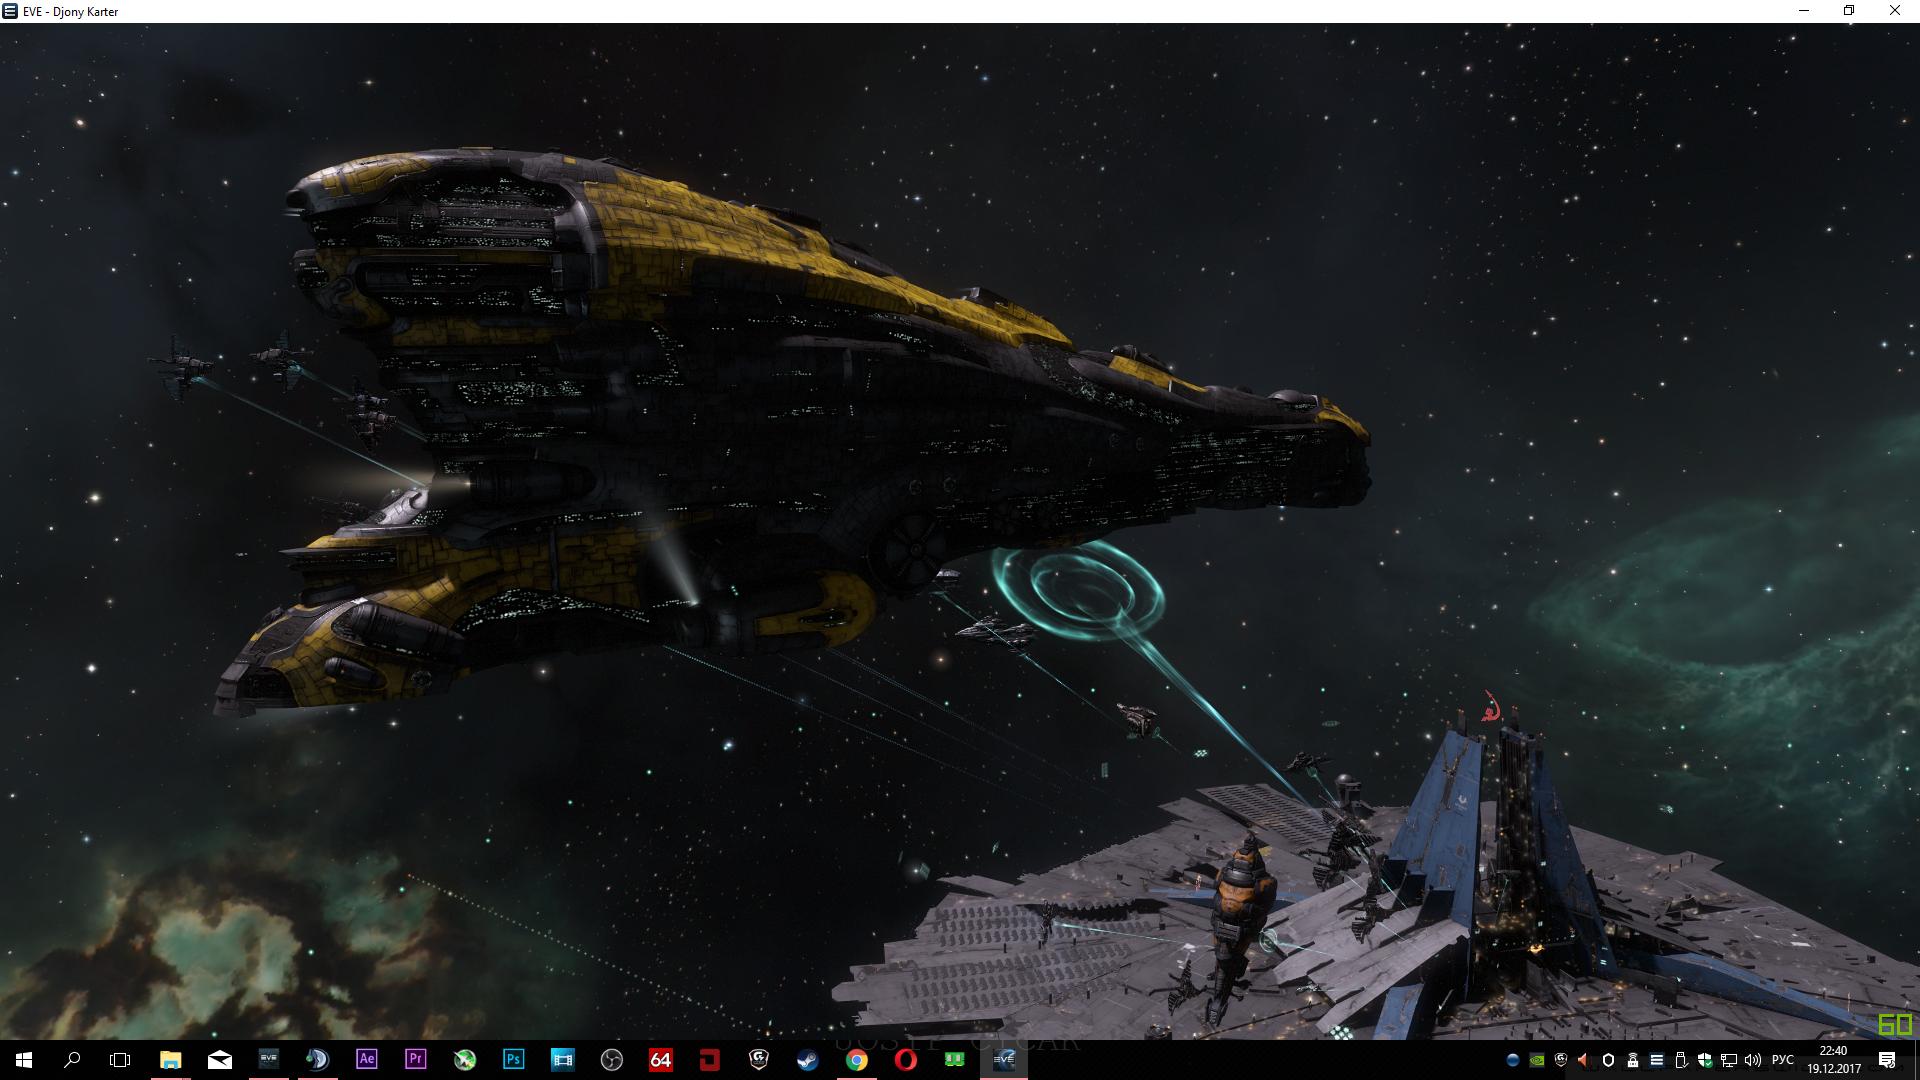 Desktop Screenshot 2017.12.19 - 22.40.01.70.png - EVE Online